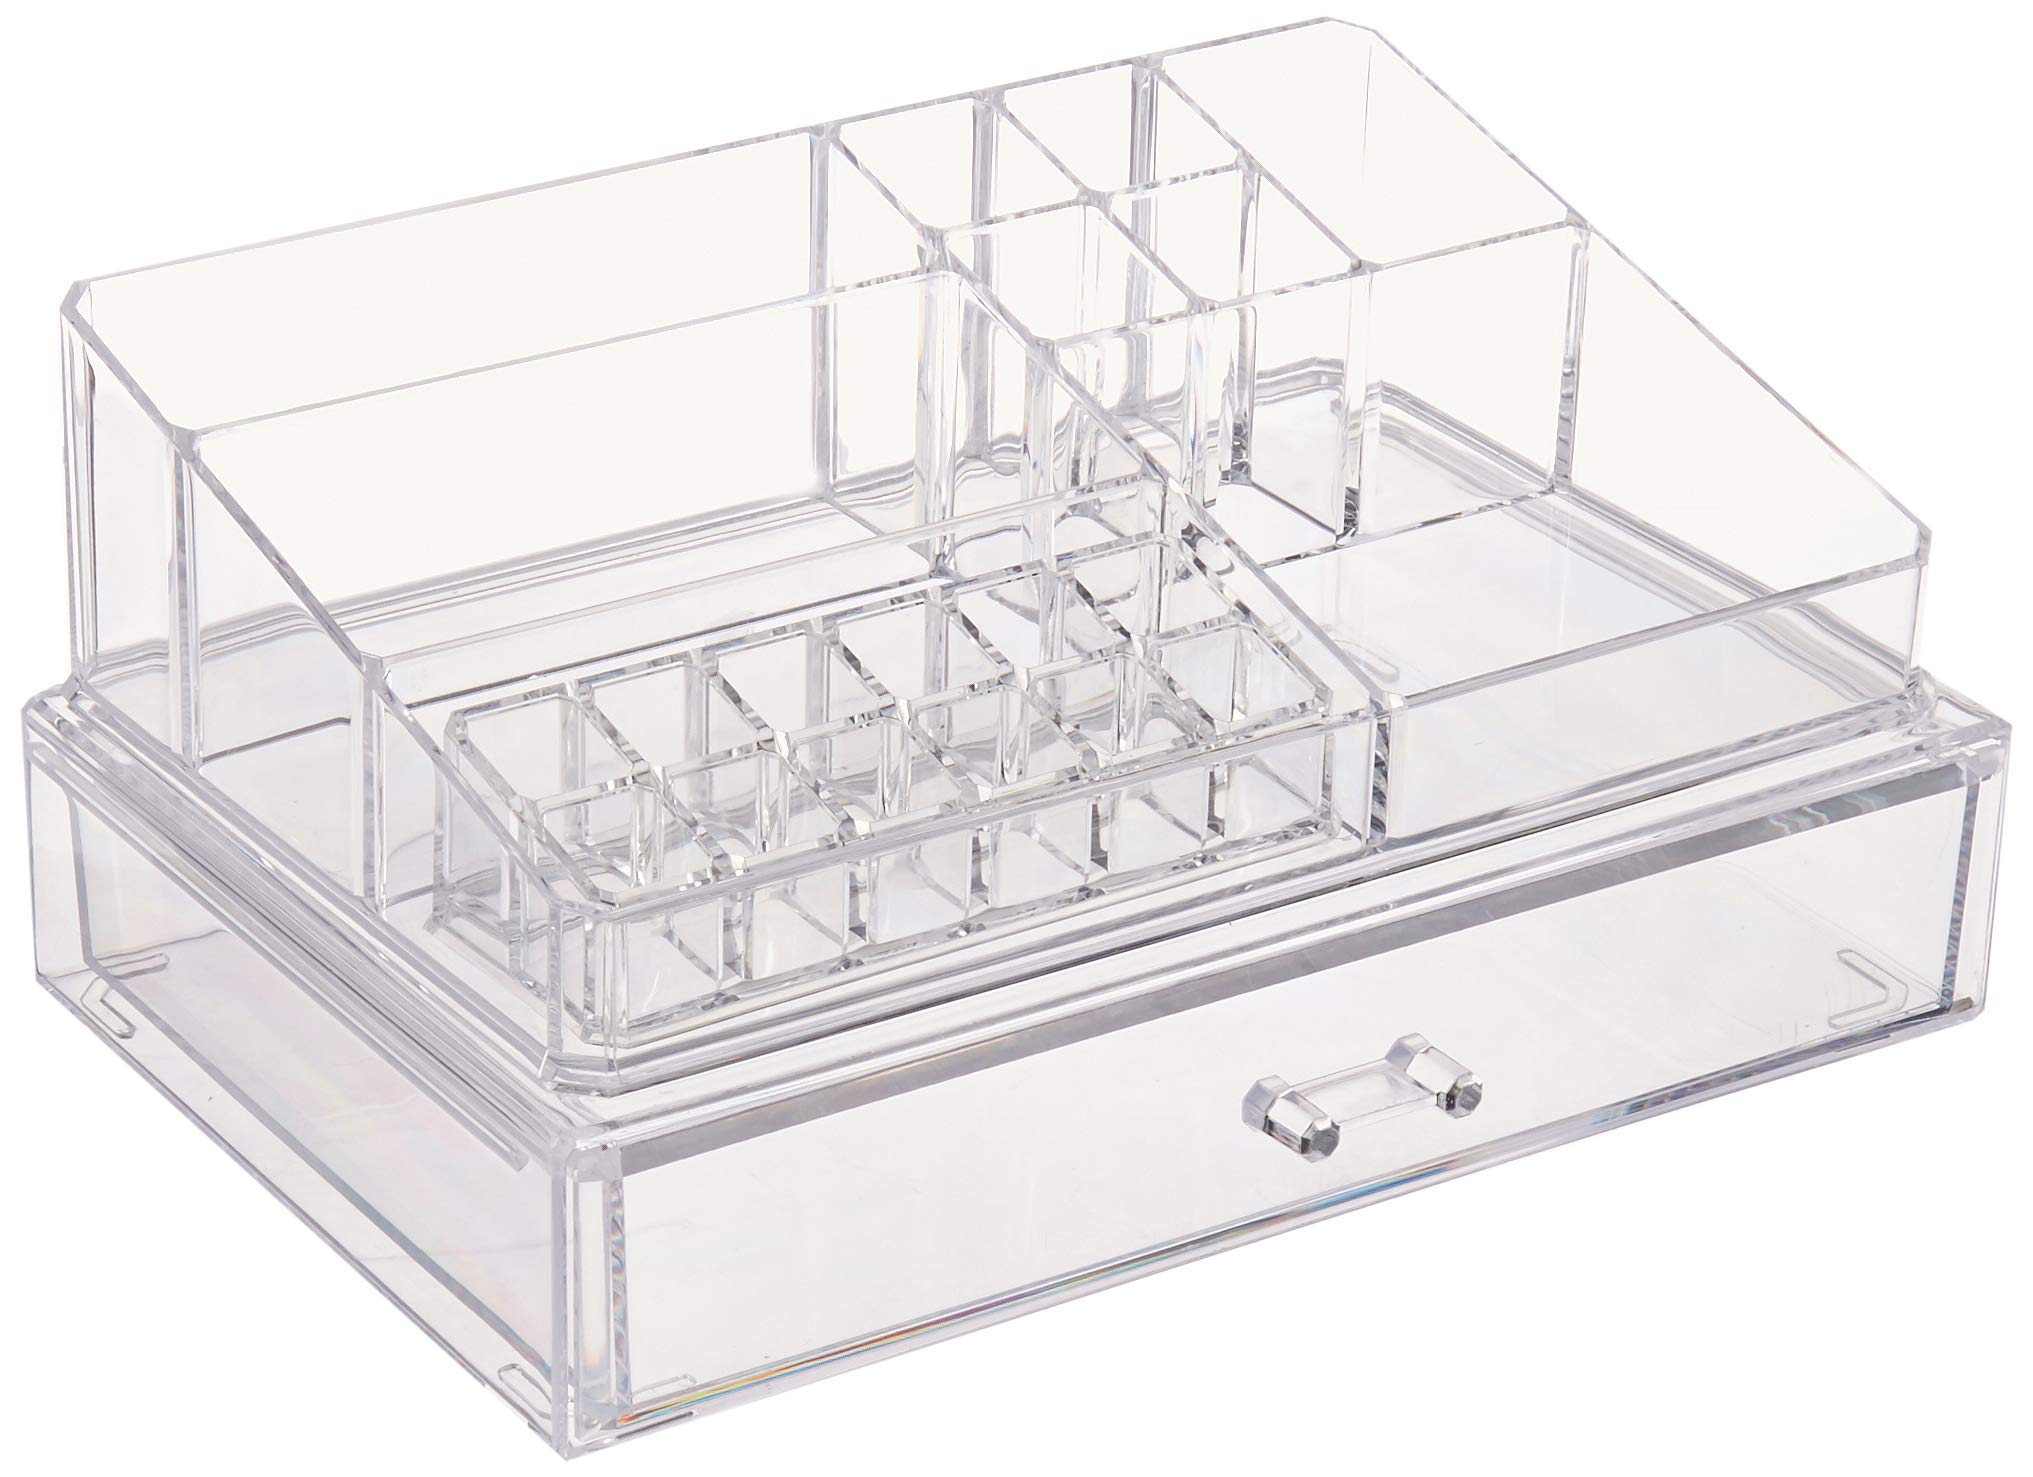 Richards Homewares 987881 Clear Acrylic Personal Organizer with XL Drawer